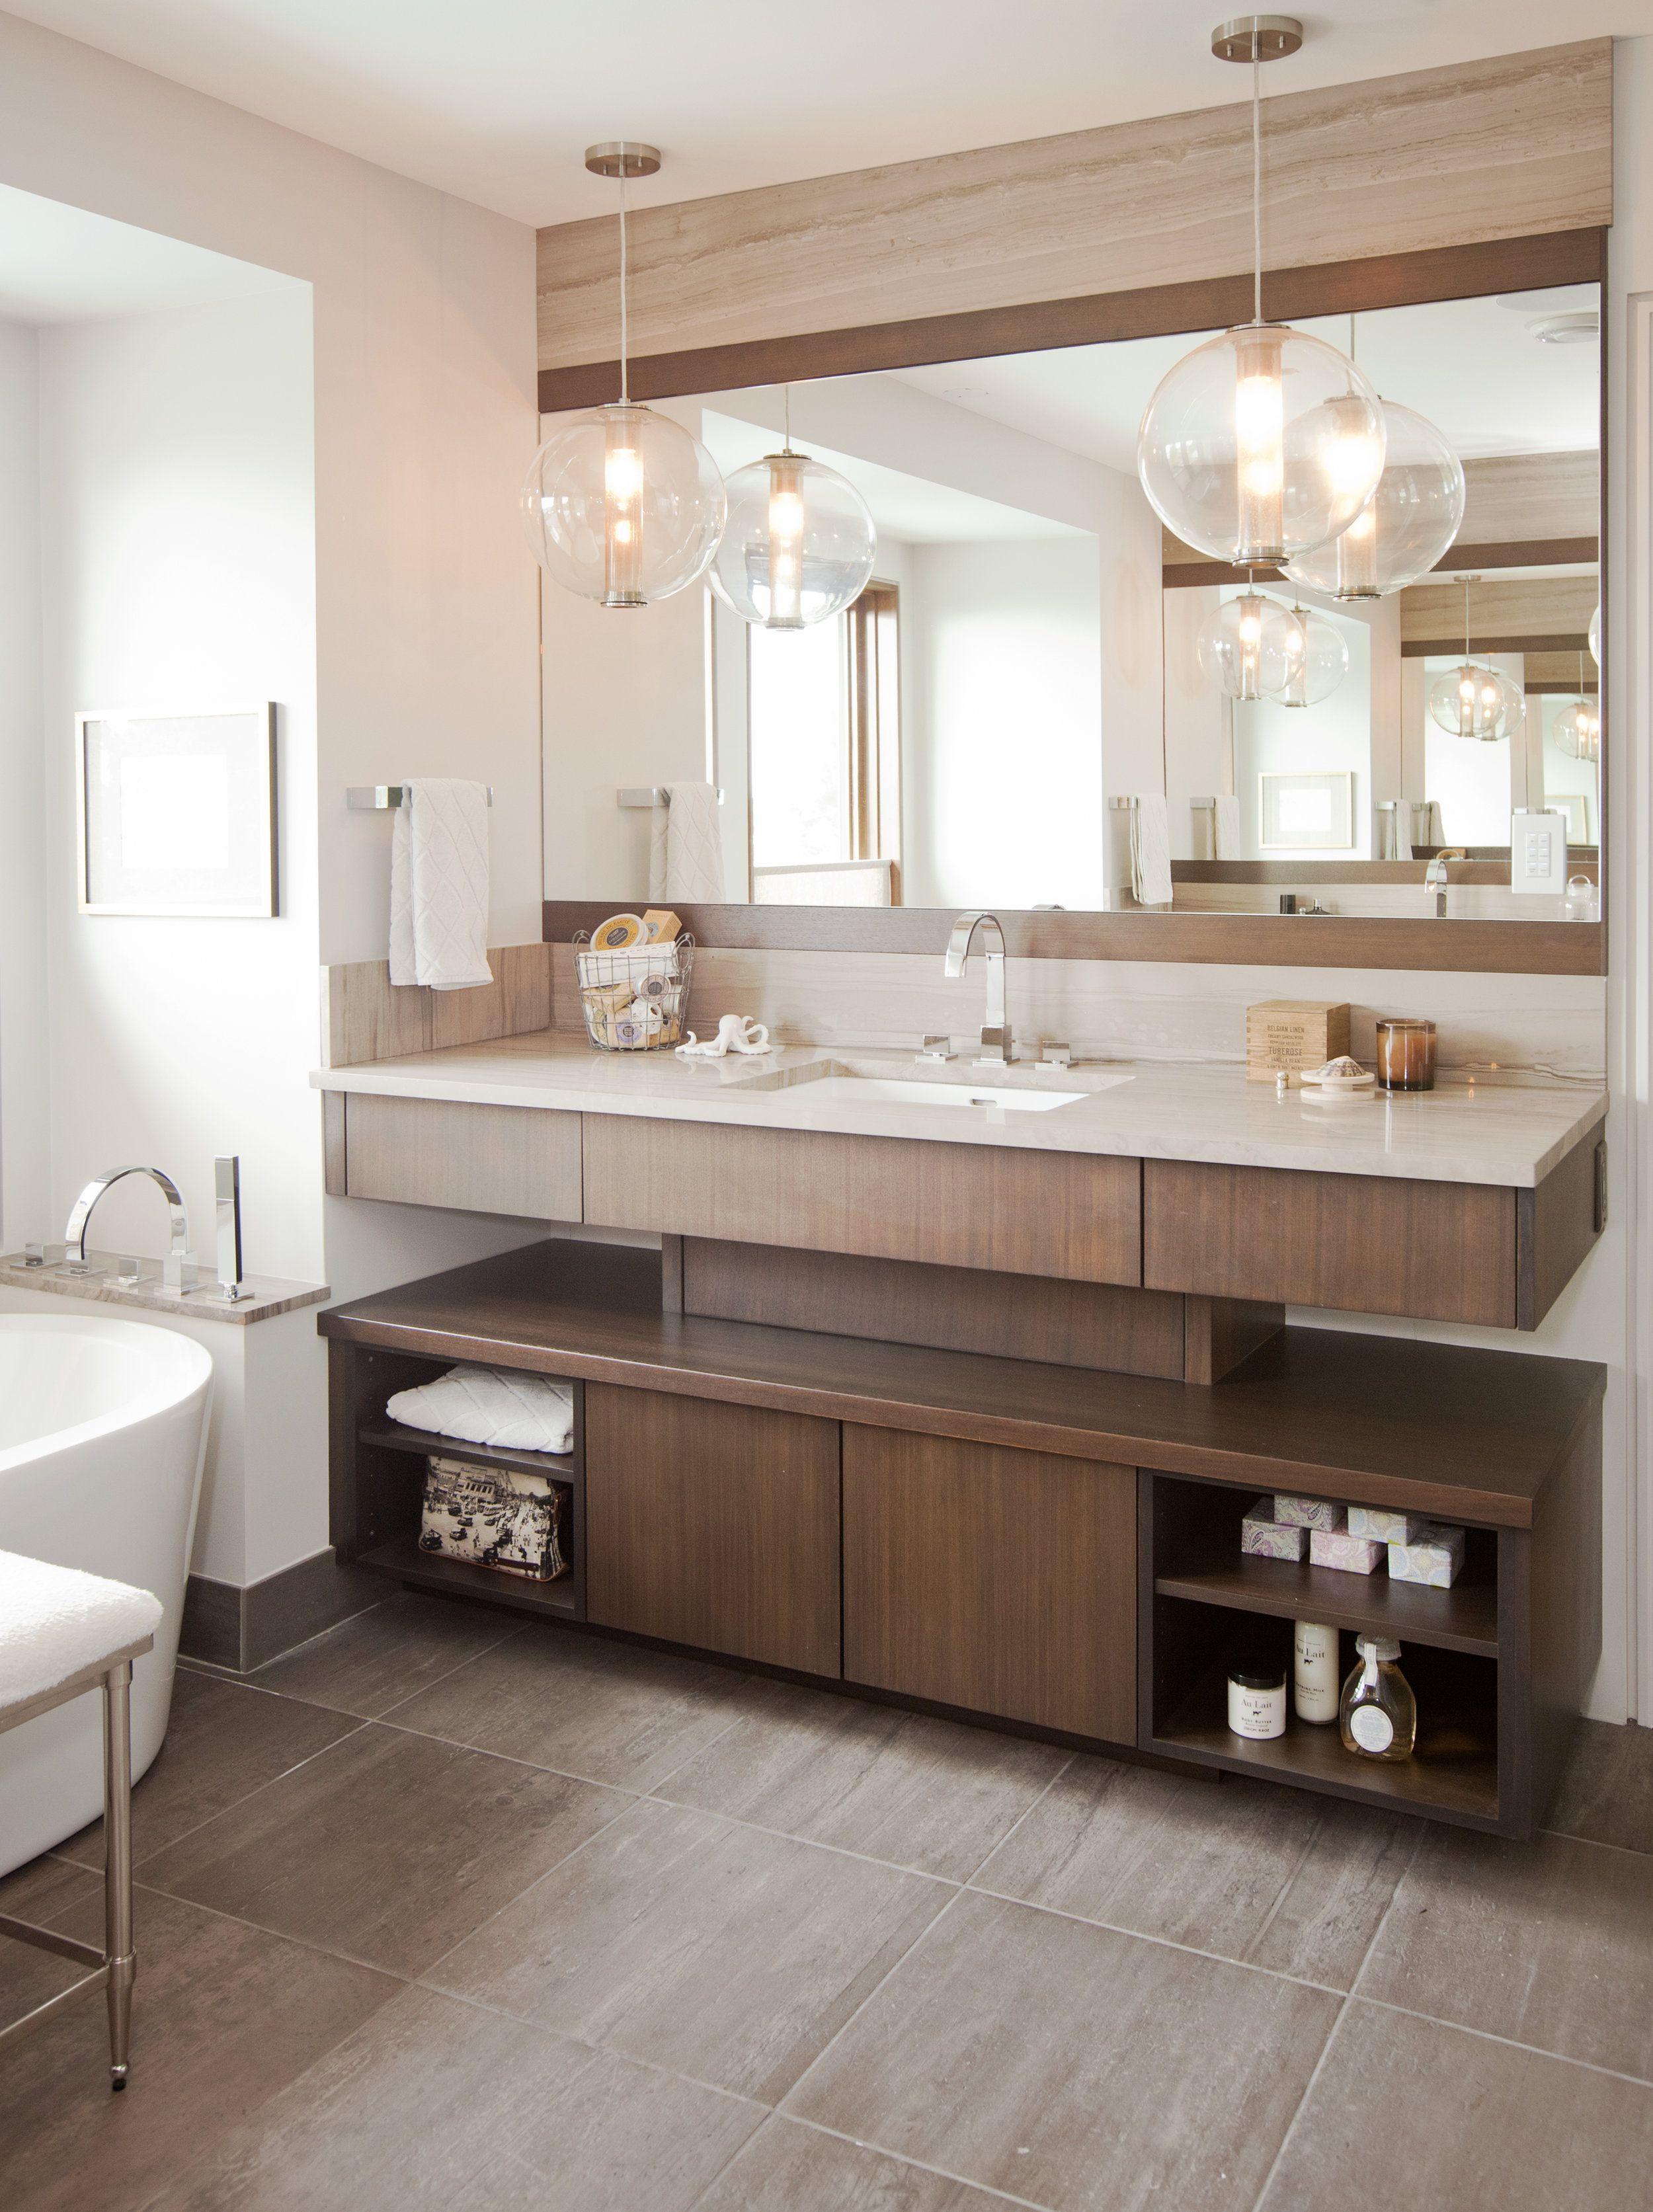 Budget Bathroom Designs  June, 2018